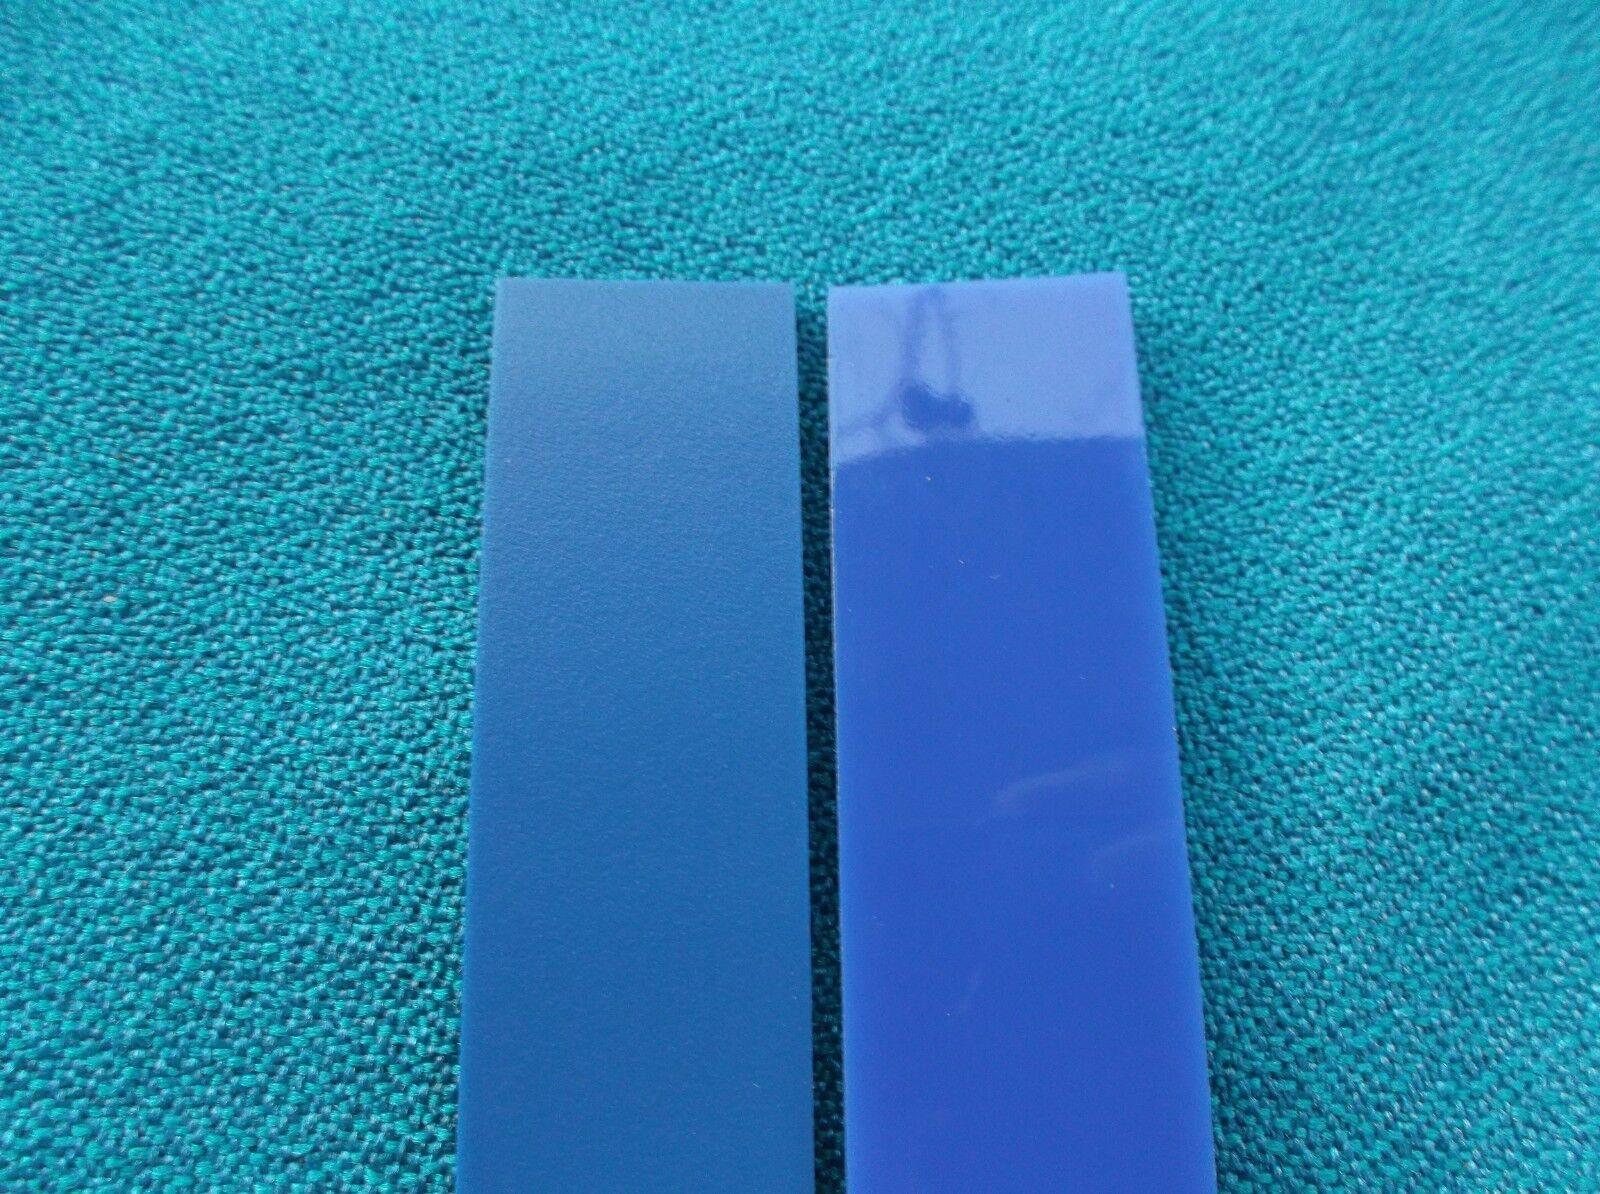 BLUE MAX URETHANE BAND SAW TIRE SET REPLACES CRAFTSMAN PART 13033    2 TIRE SET